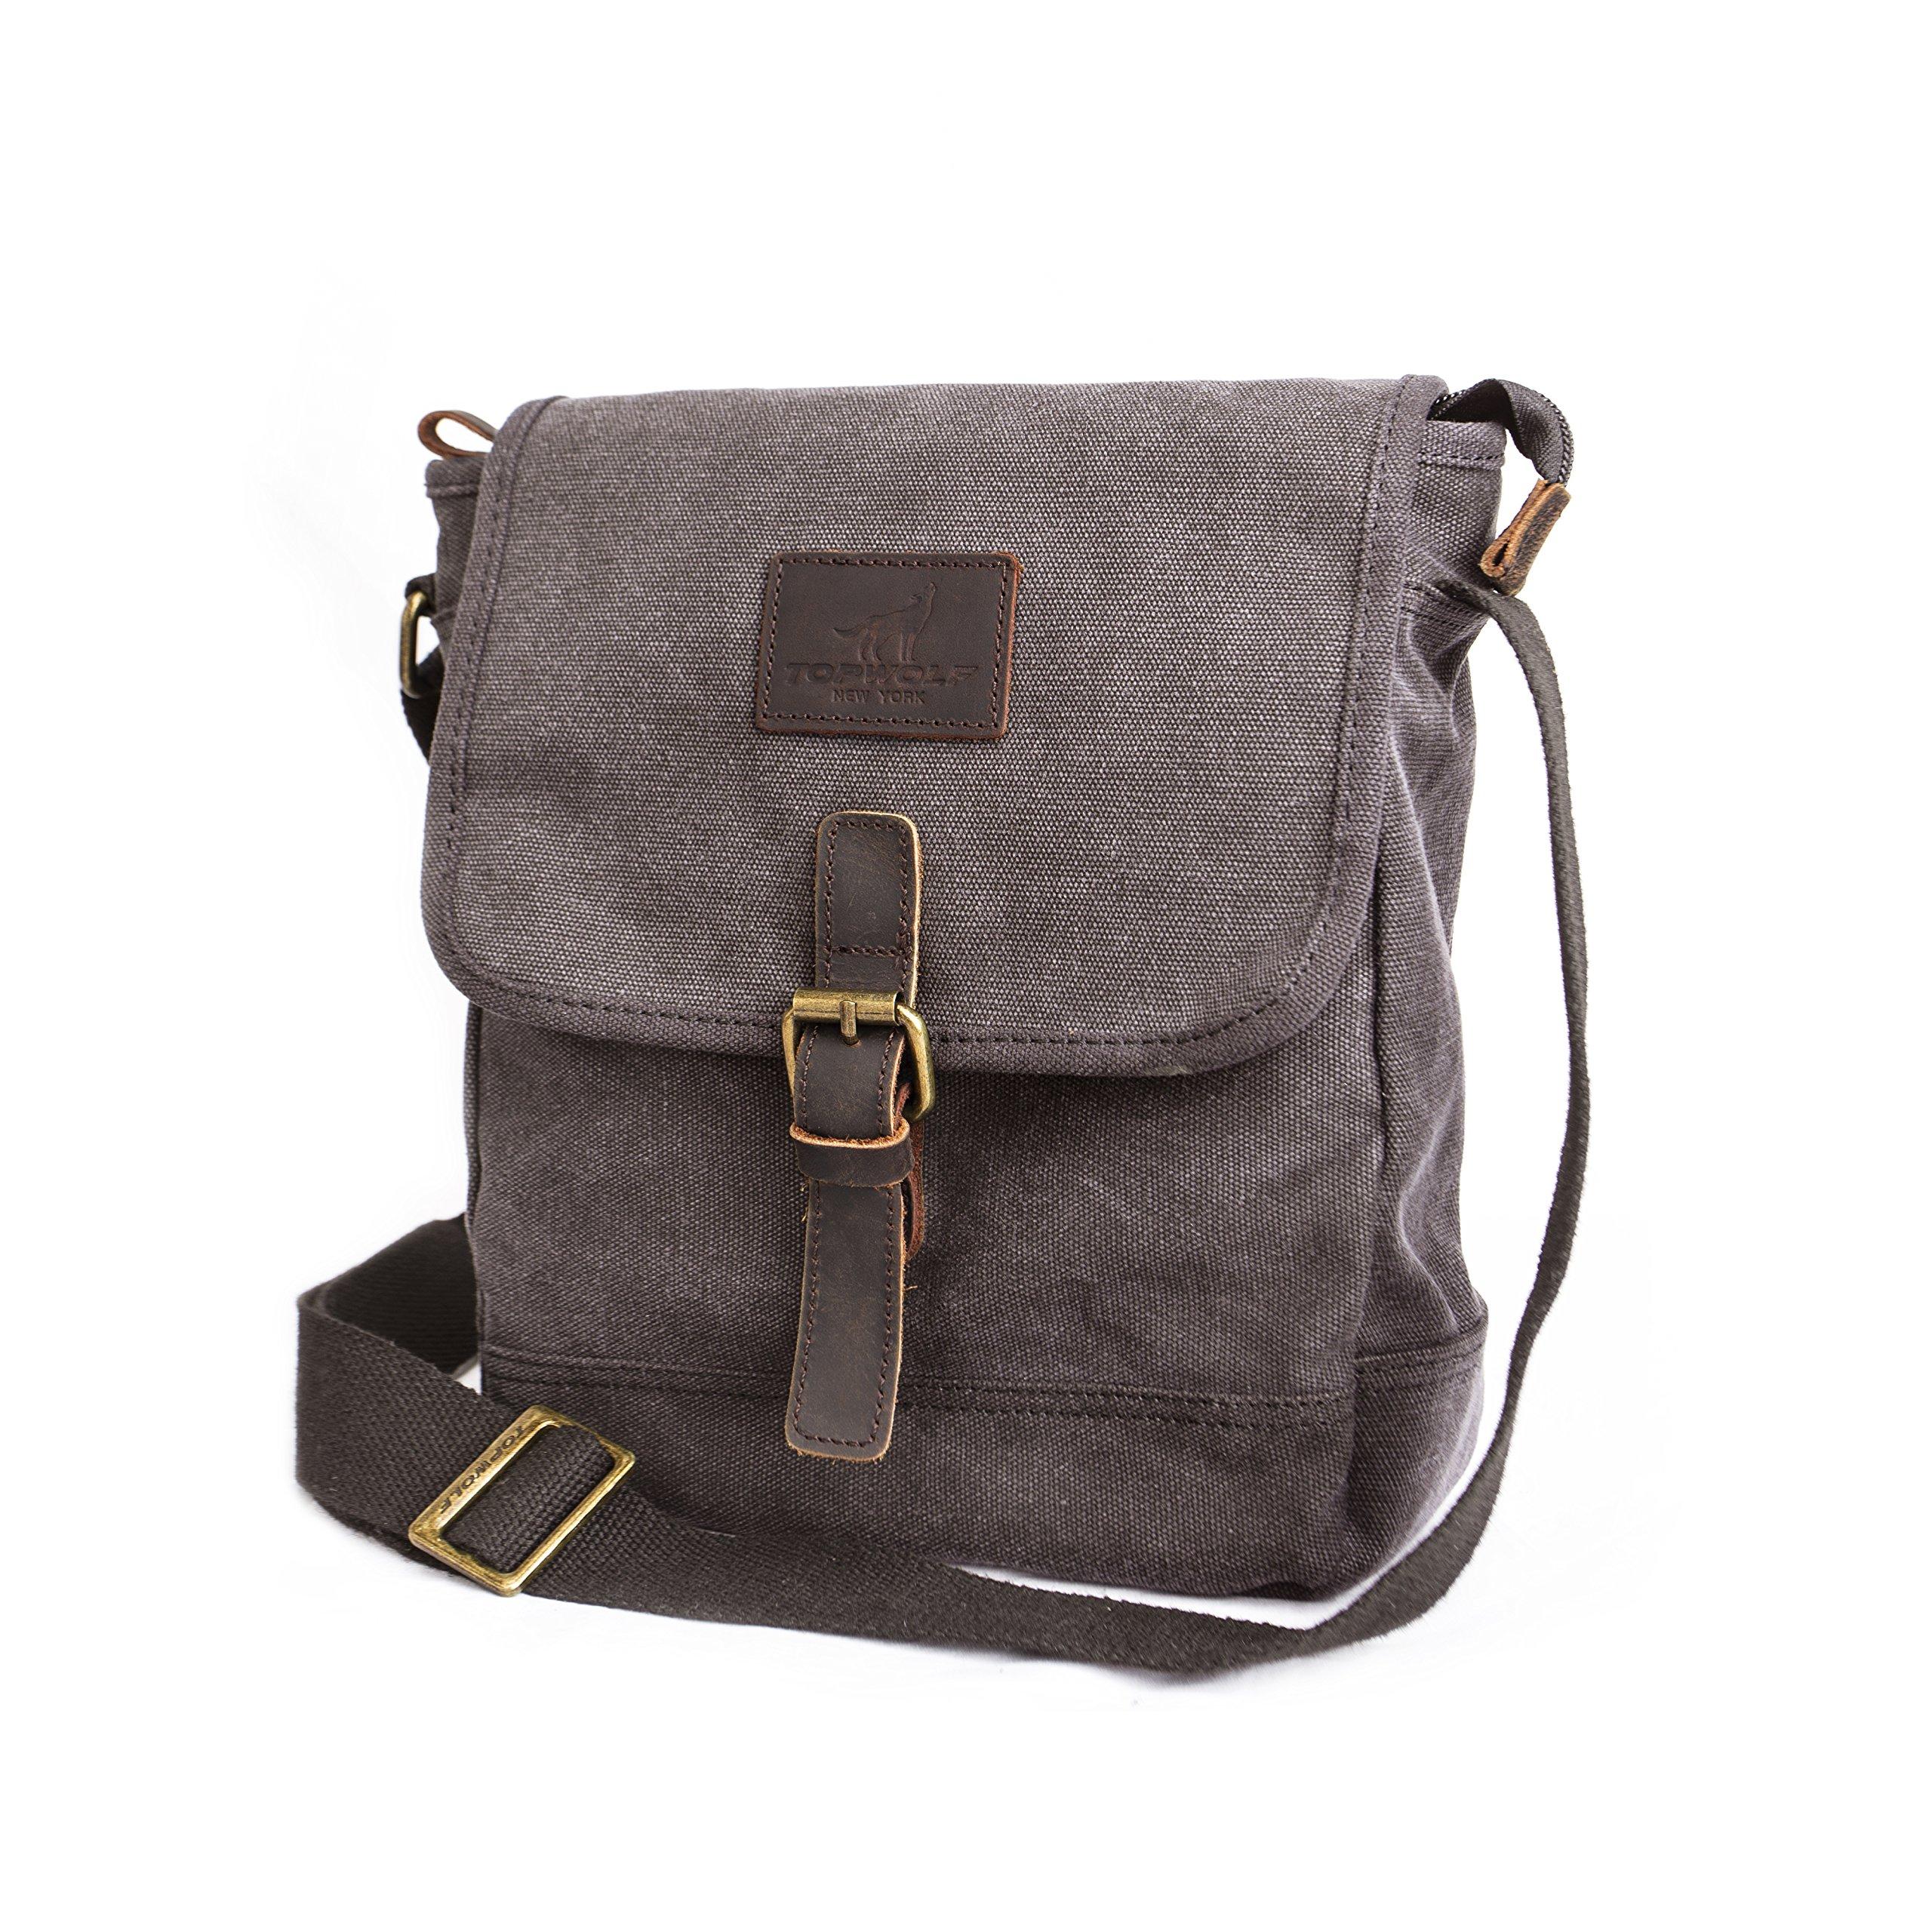 Canvas Crossbody Bag TOPWOLF Small Messenger Casual Travel Working Tools Bag Shoulder Bag Easily Hold Phone Handset Key Sunglasses Khaki